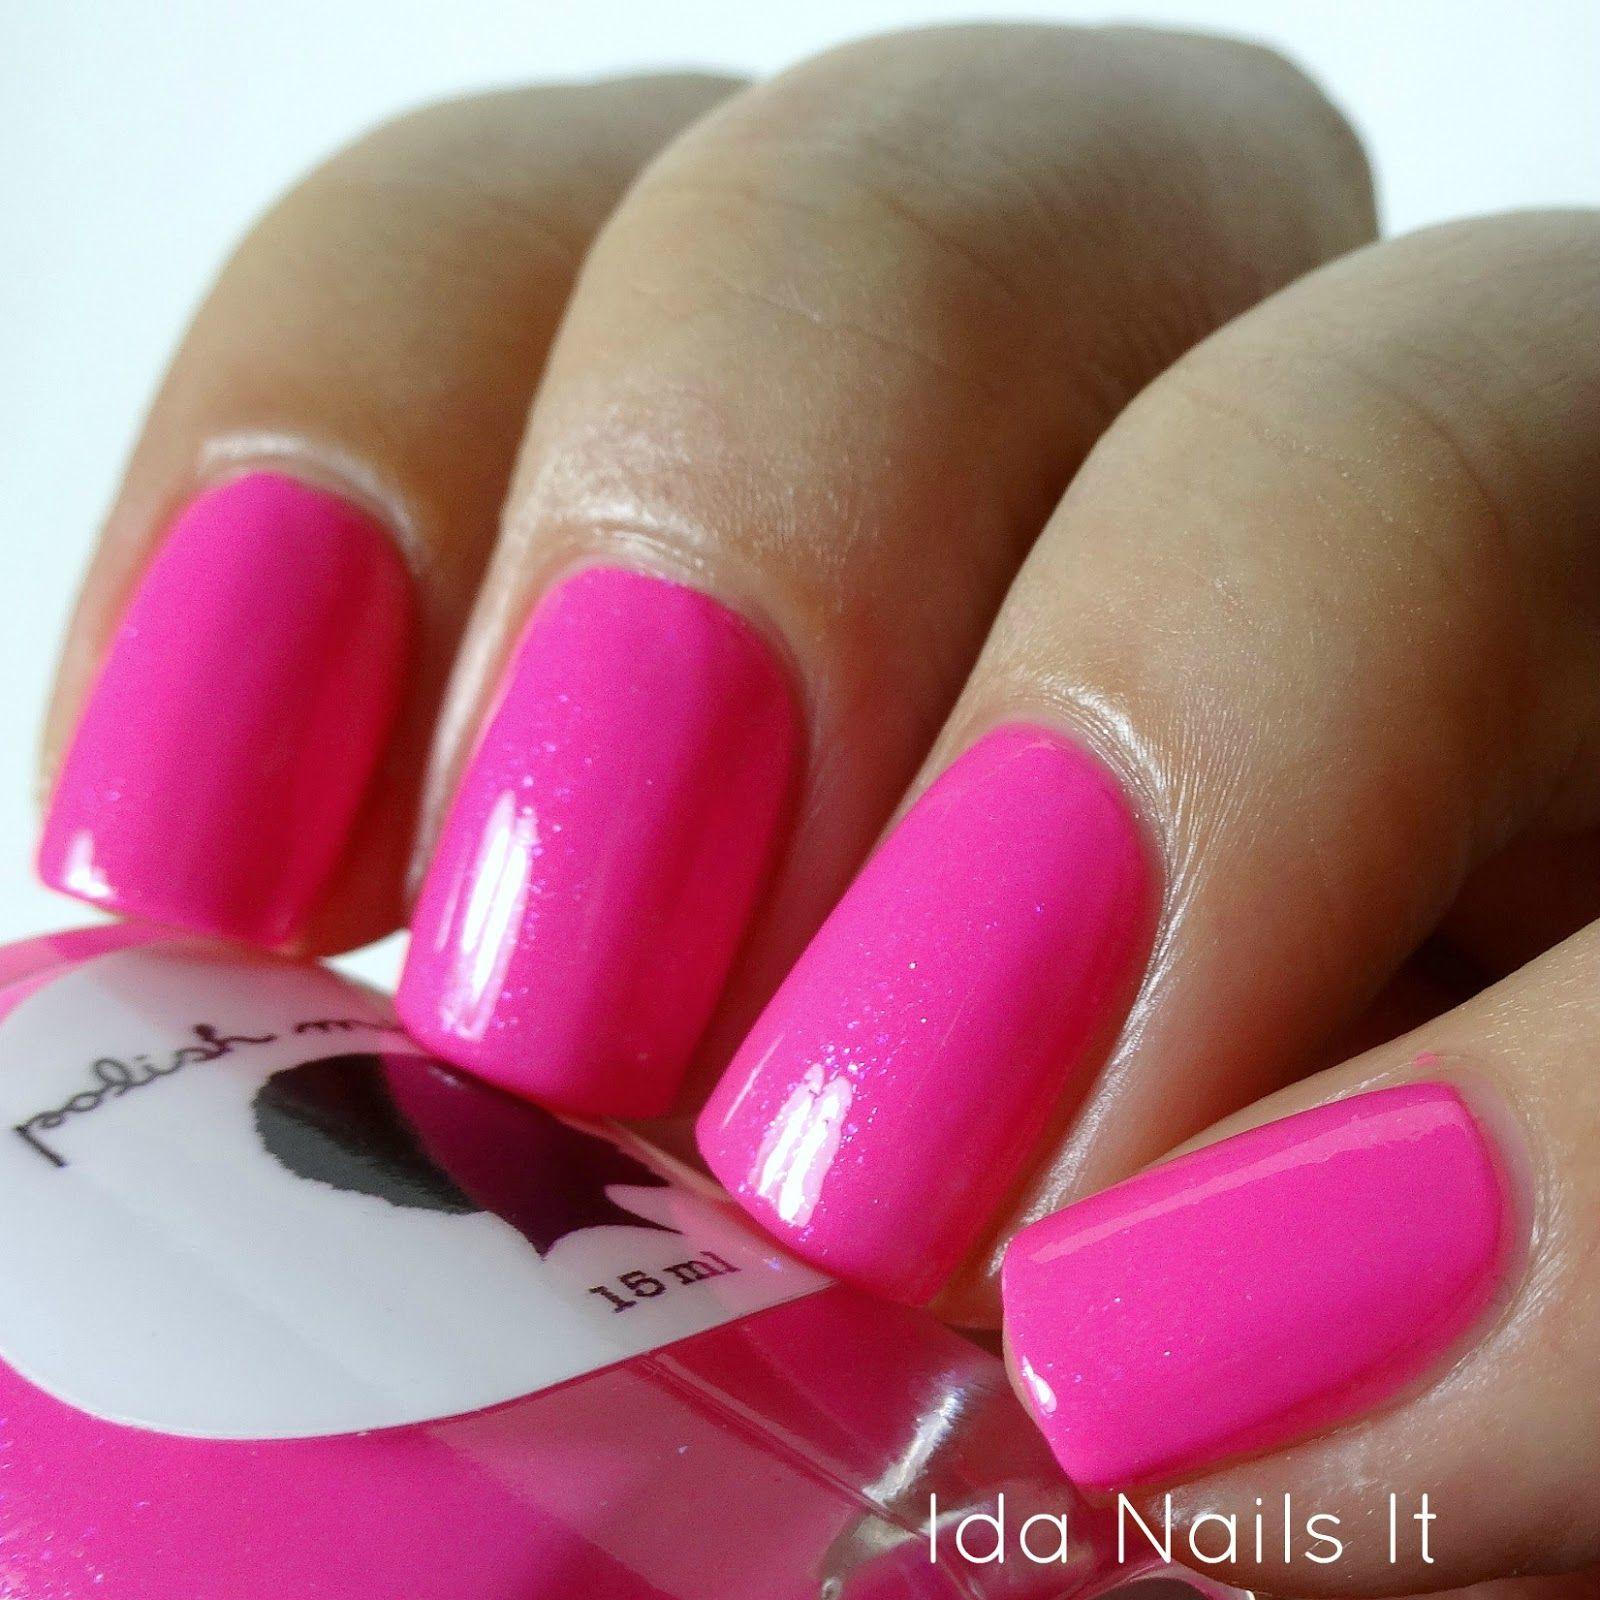 Ida Nails It: Polish My Life Girls & Boys Collection Los Angeles ...